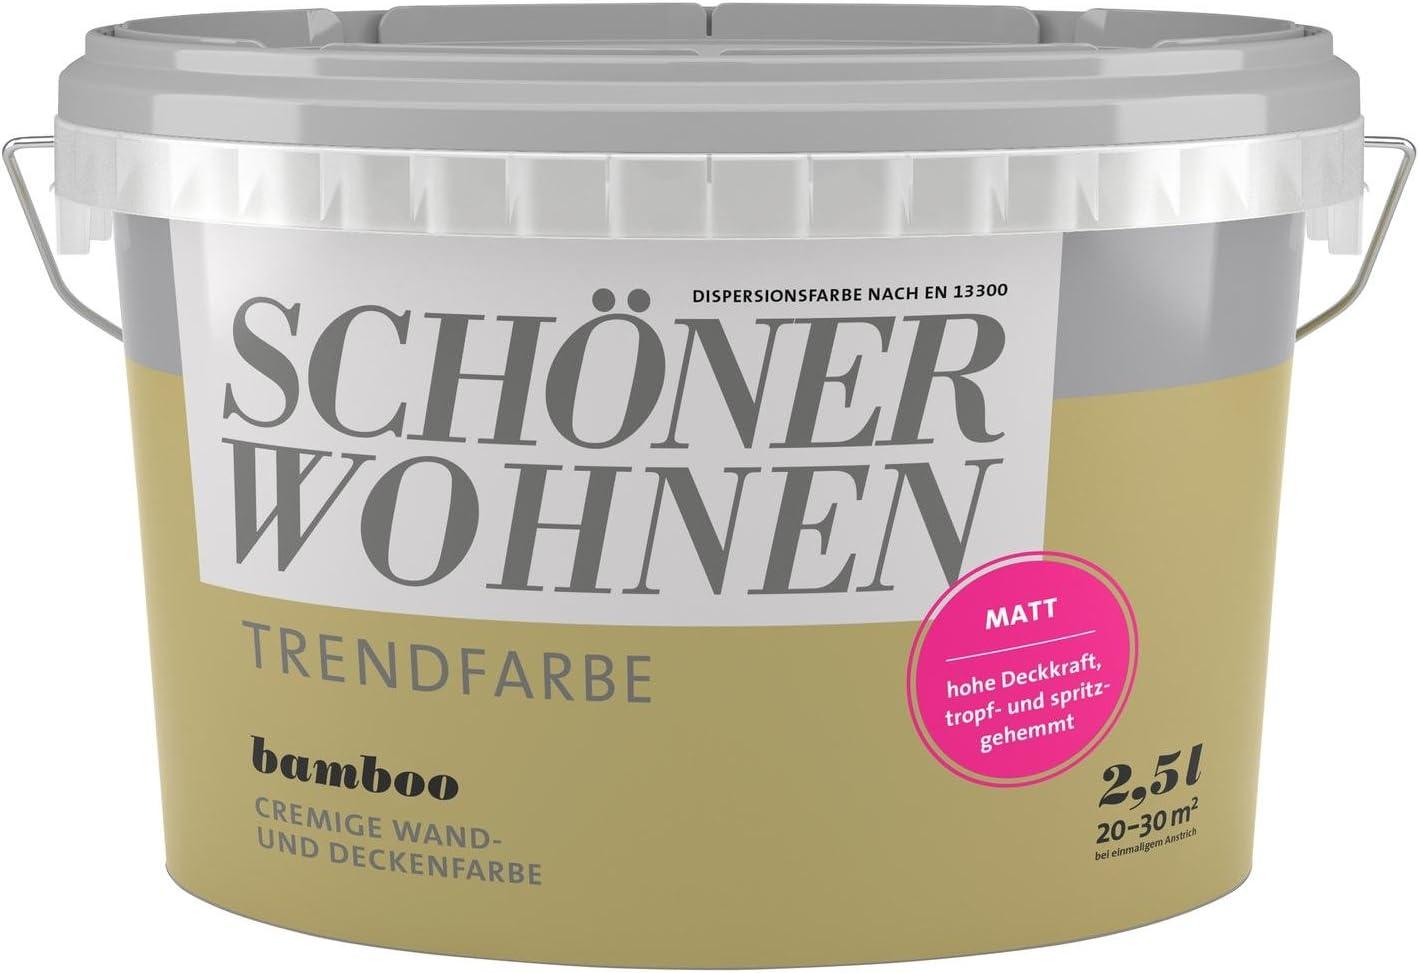 2 5 Liter Schoner Wohnen Trendfarbe Matt Bamboo Amazon De Baumarkt